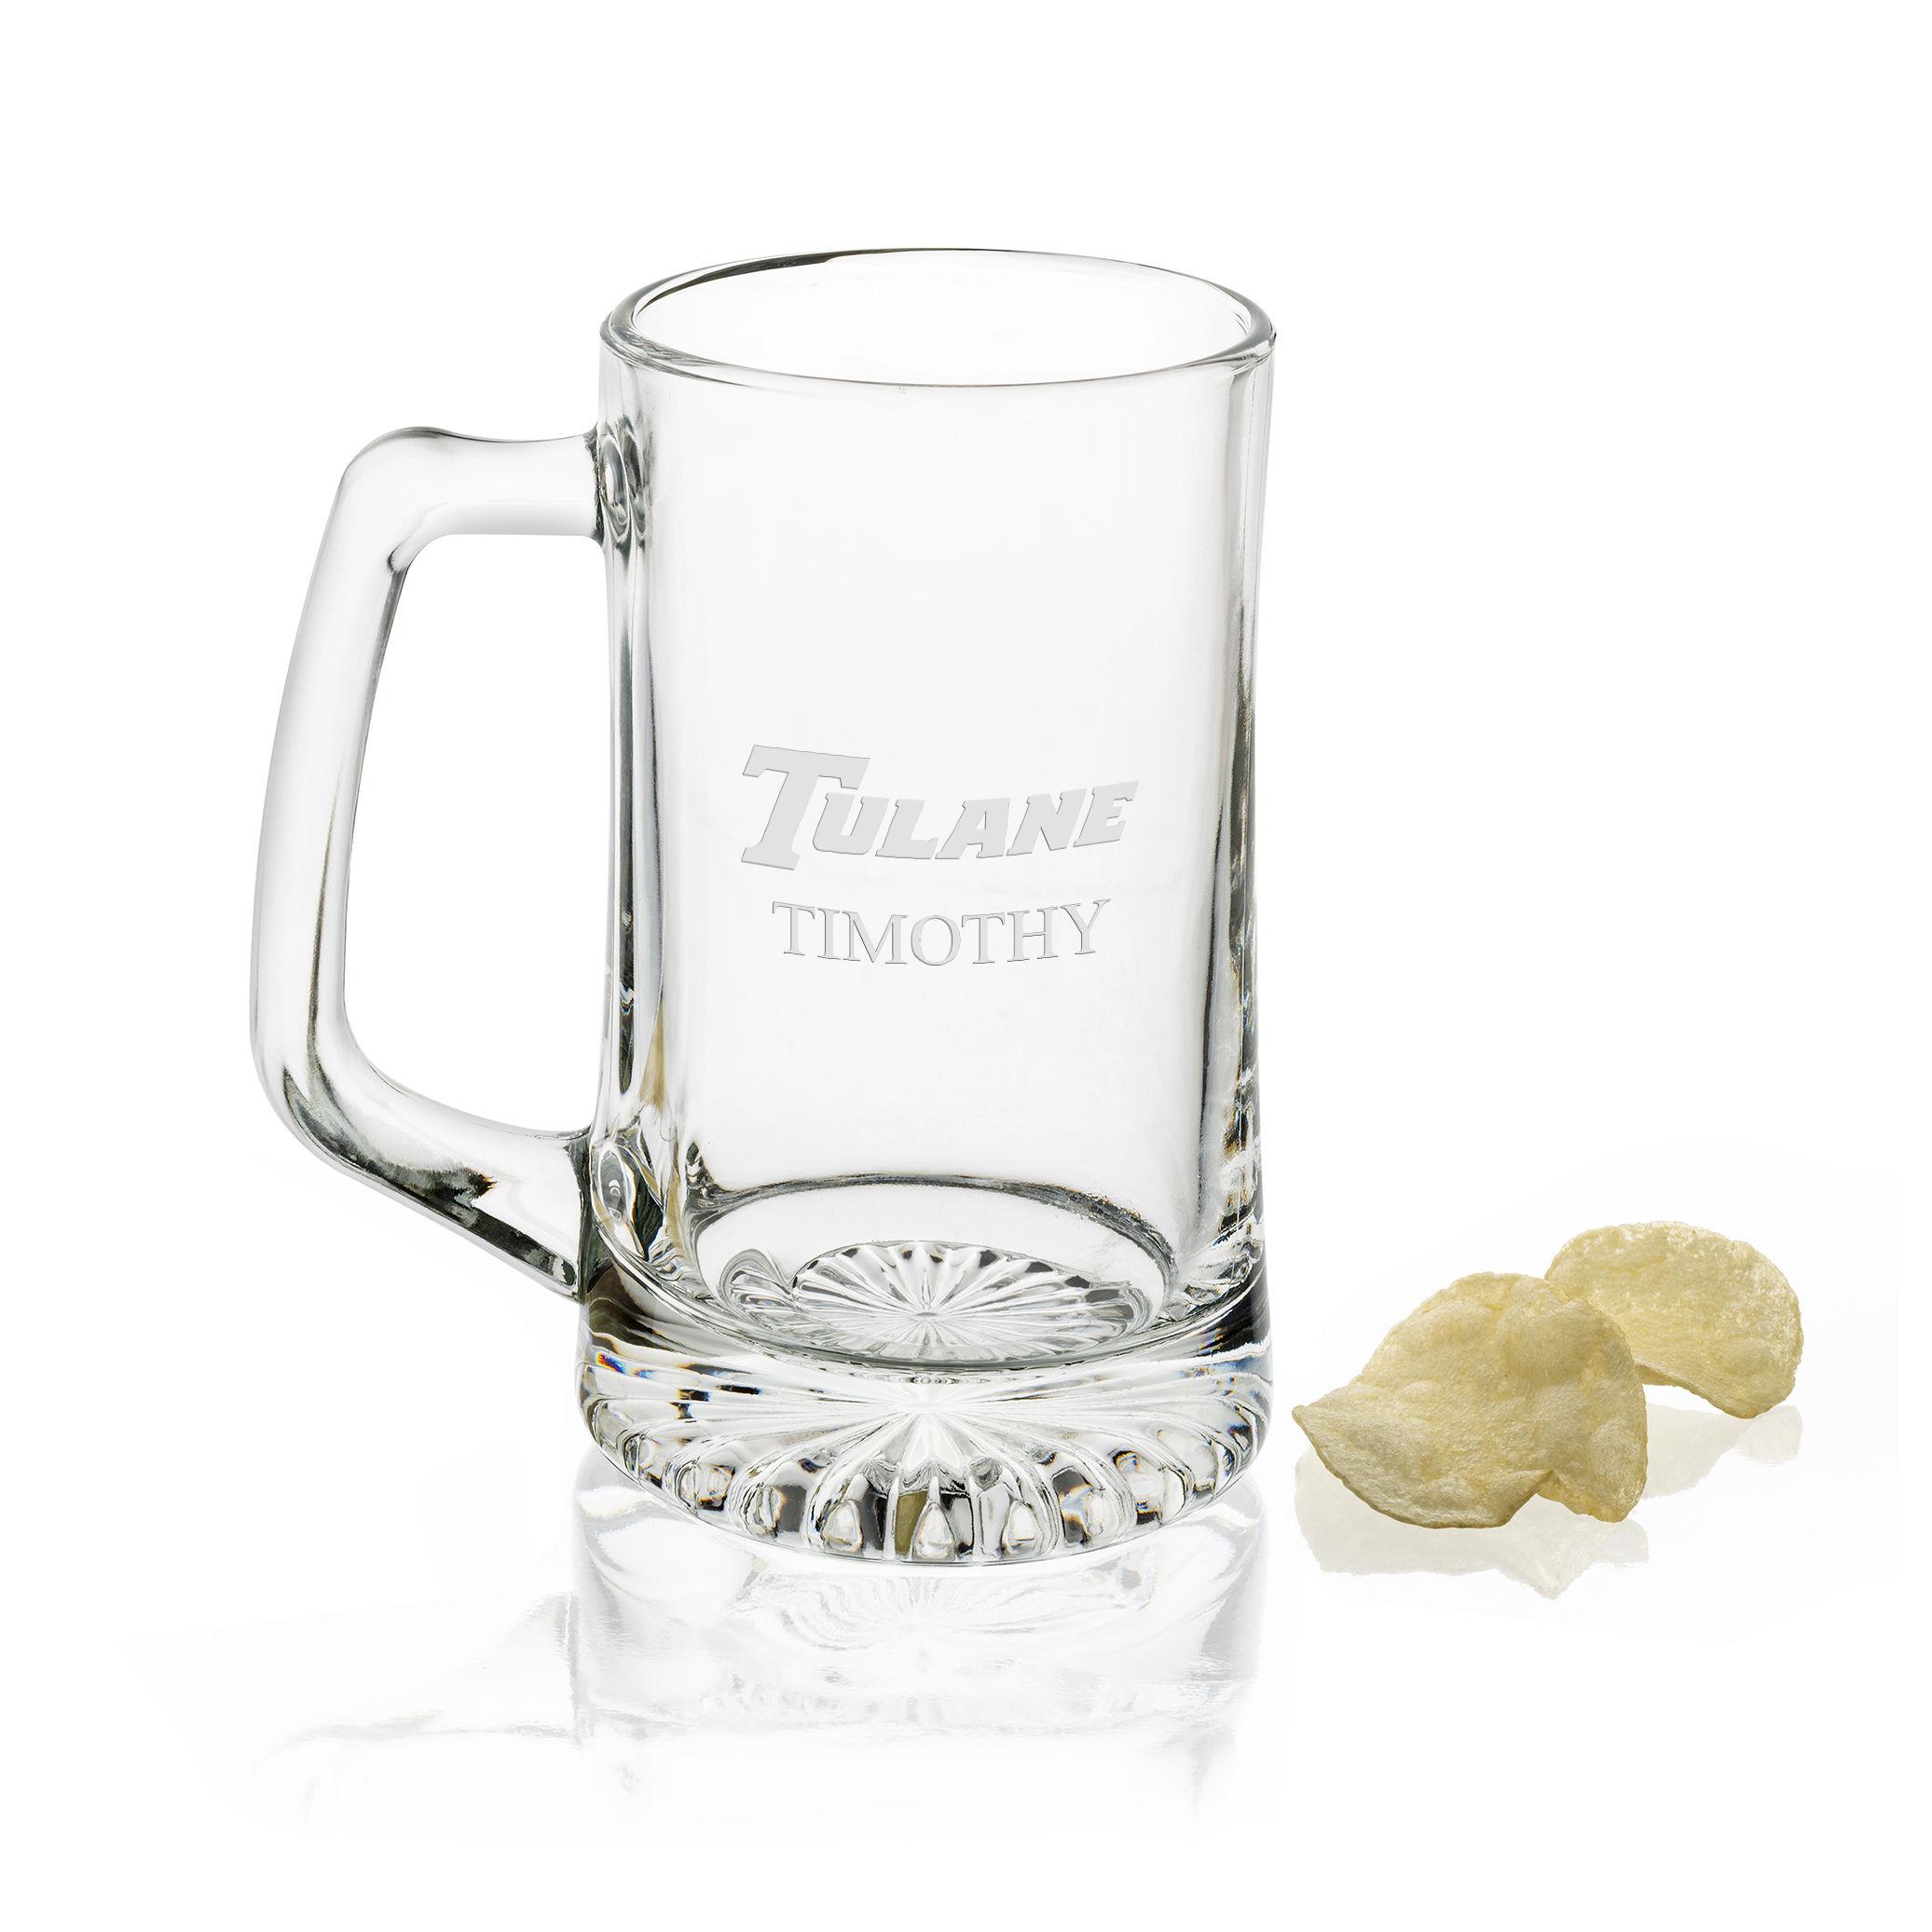 Tulane 25 oz Beer Mug